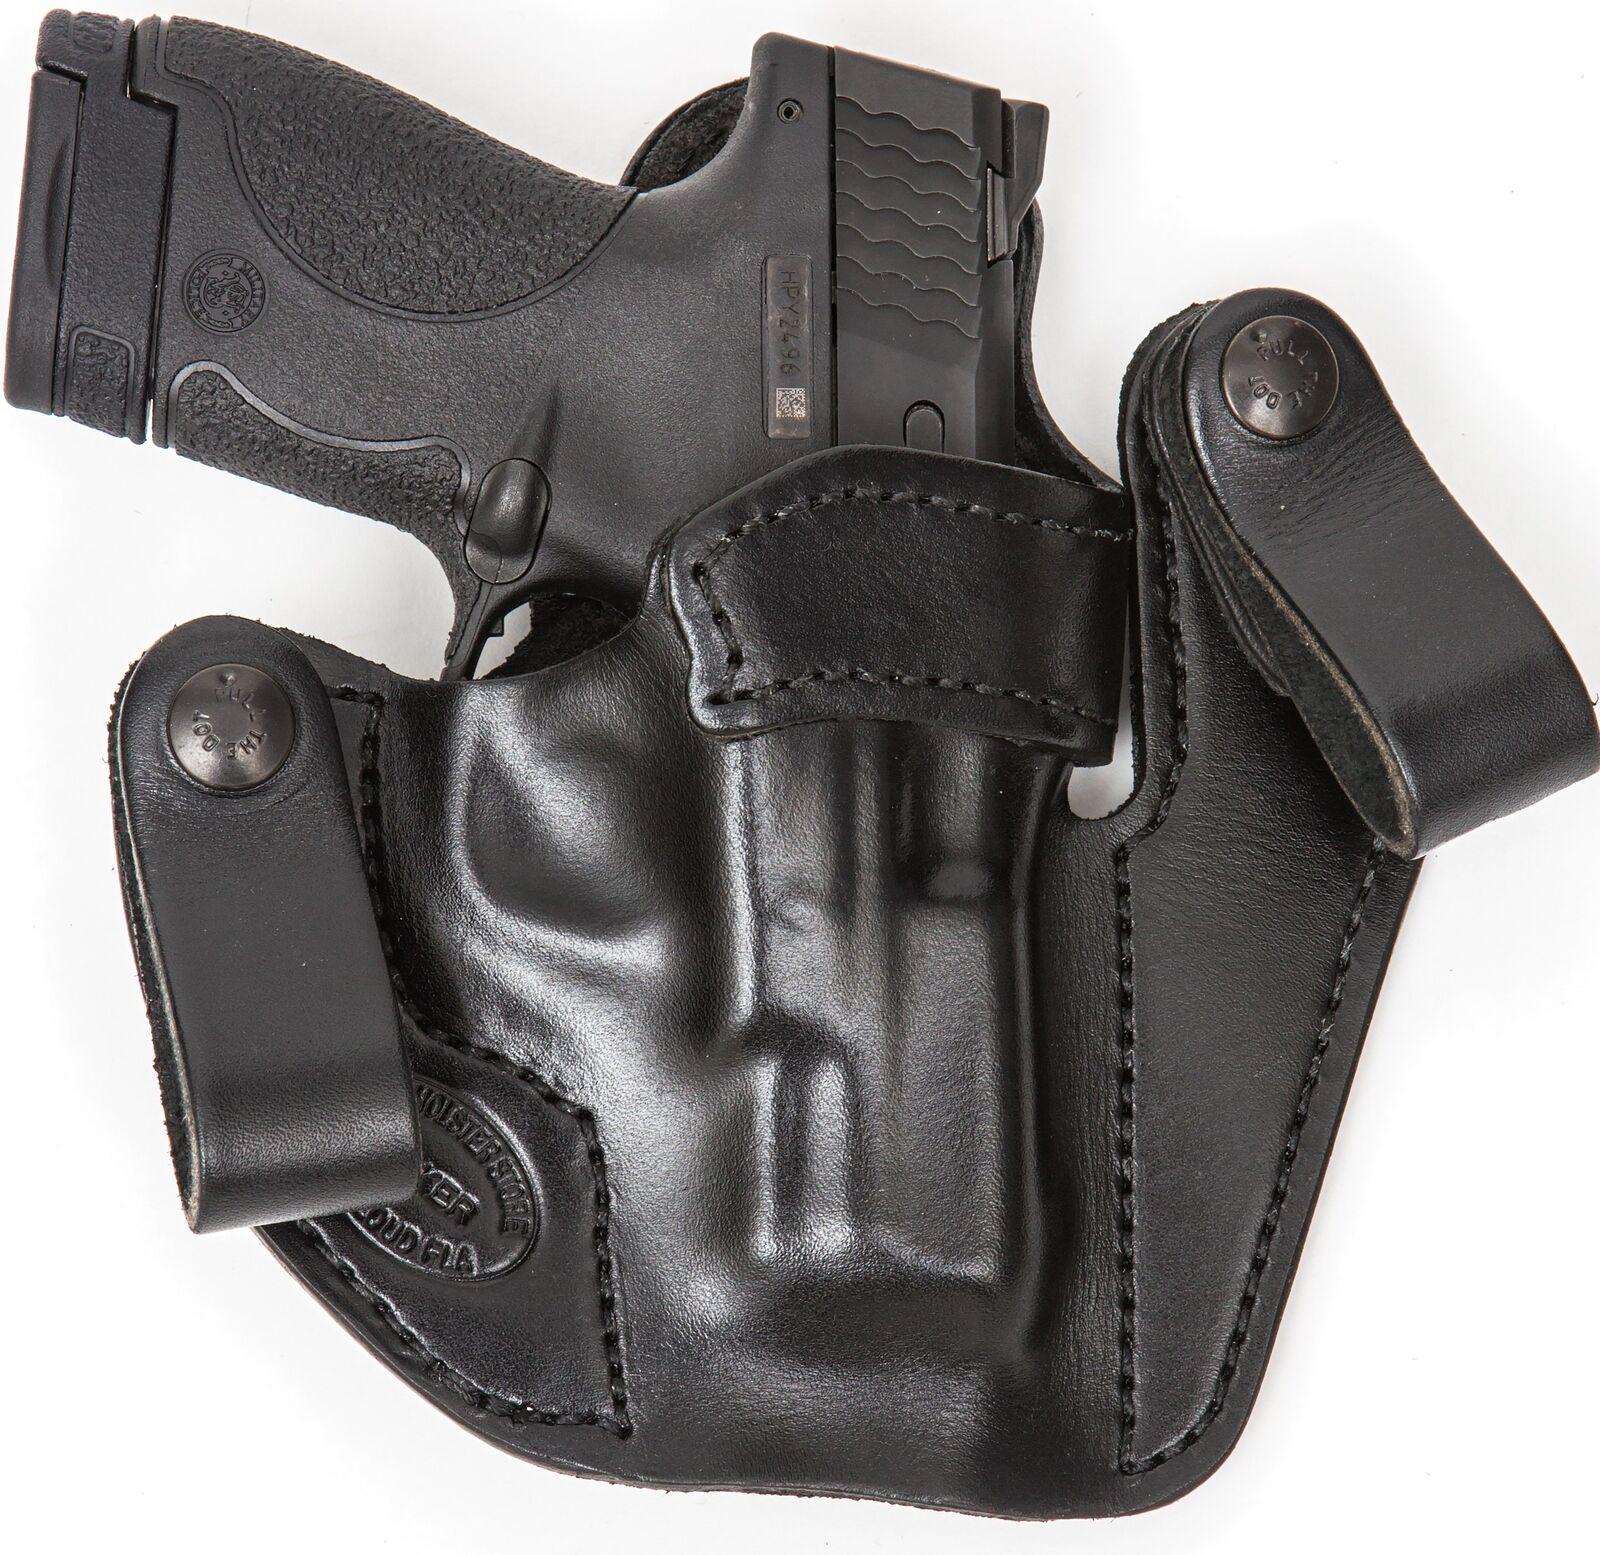 Xtreme llevar RH LH IWB Cuero Funda Pistola Para S&W guardaespaldas 38